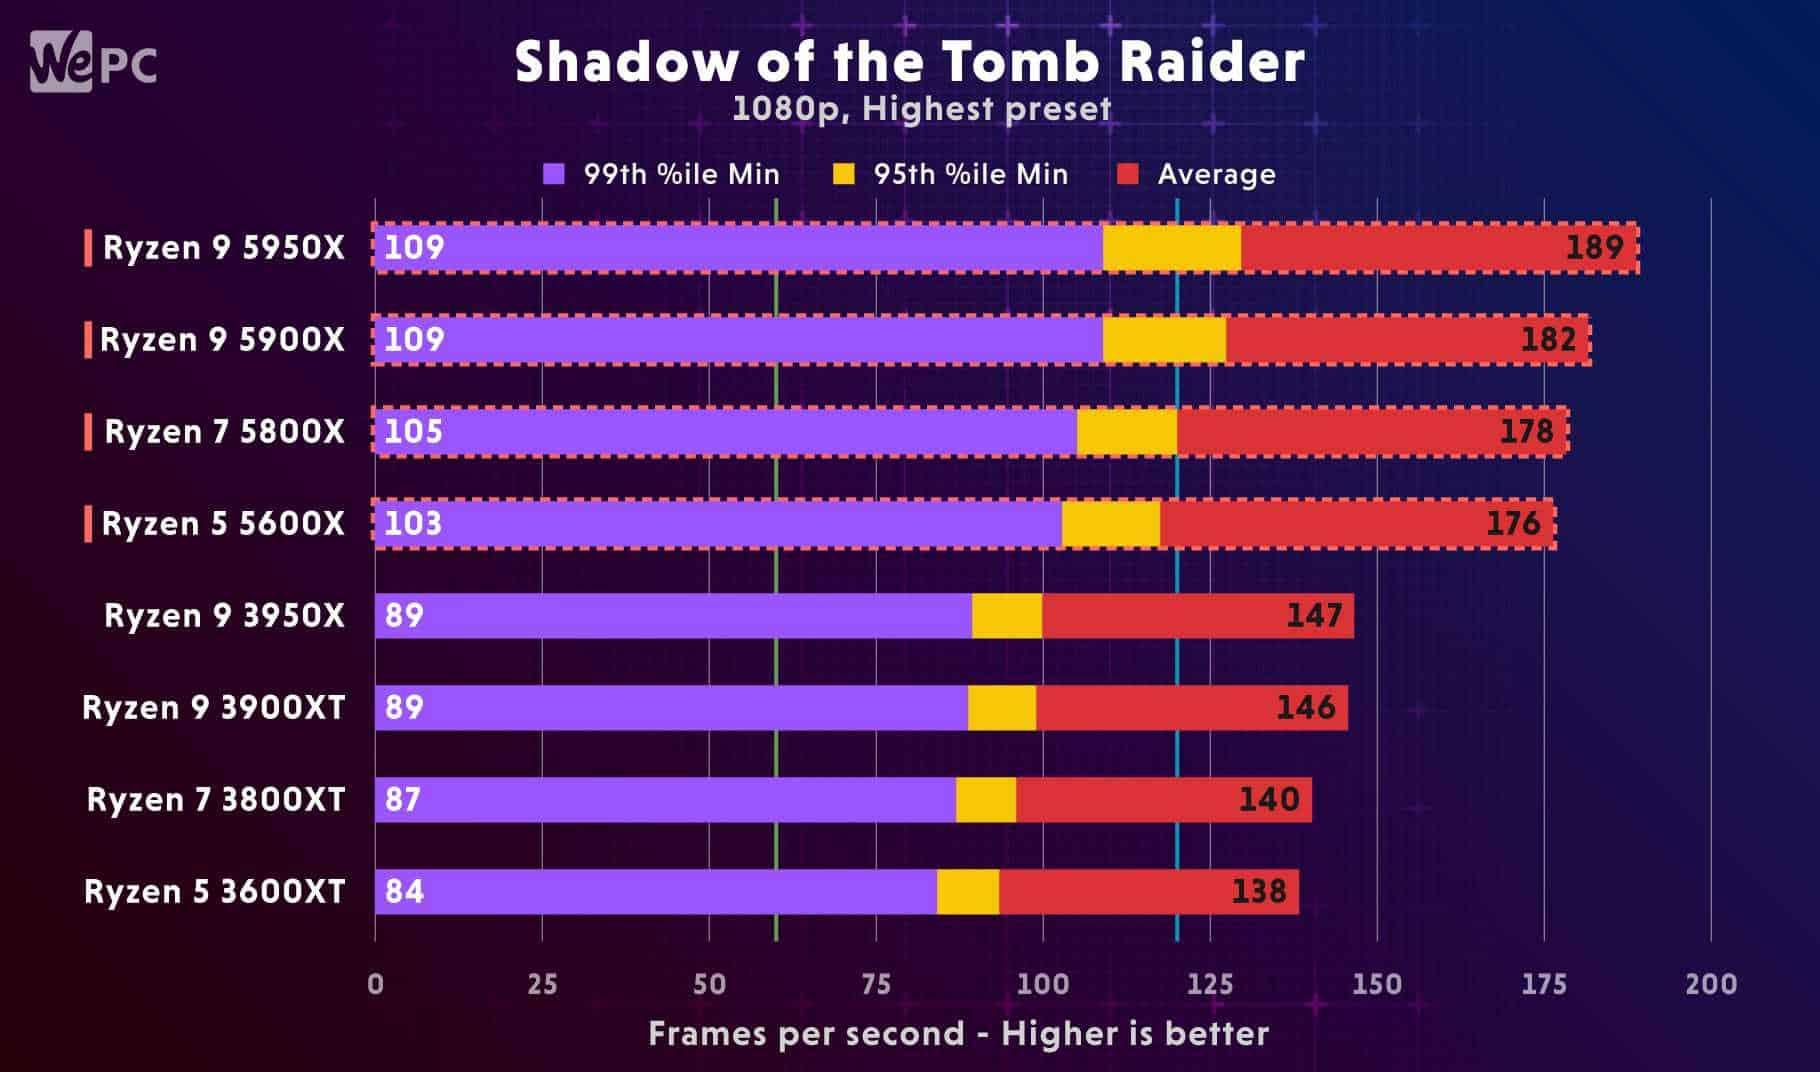 Ryzen Shadow of the Tomb Raider